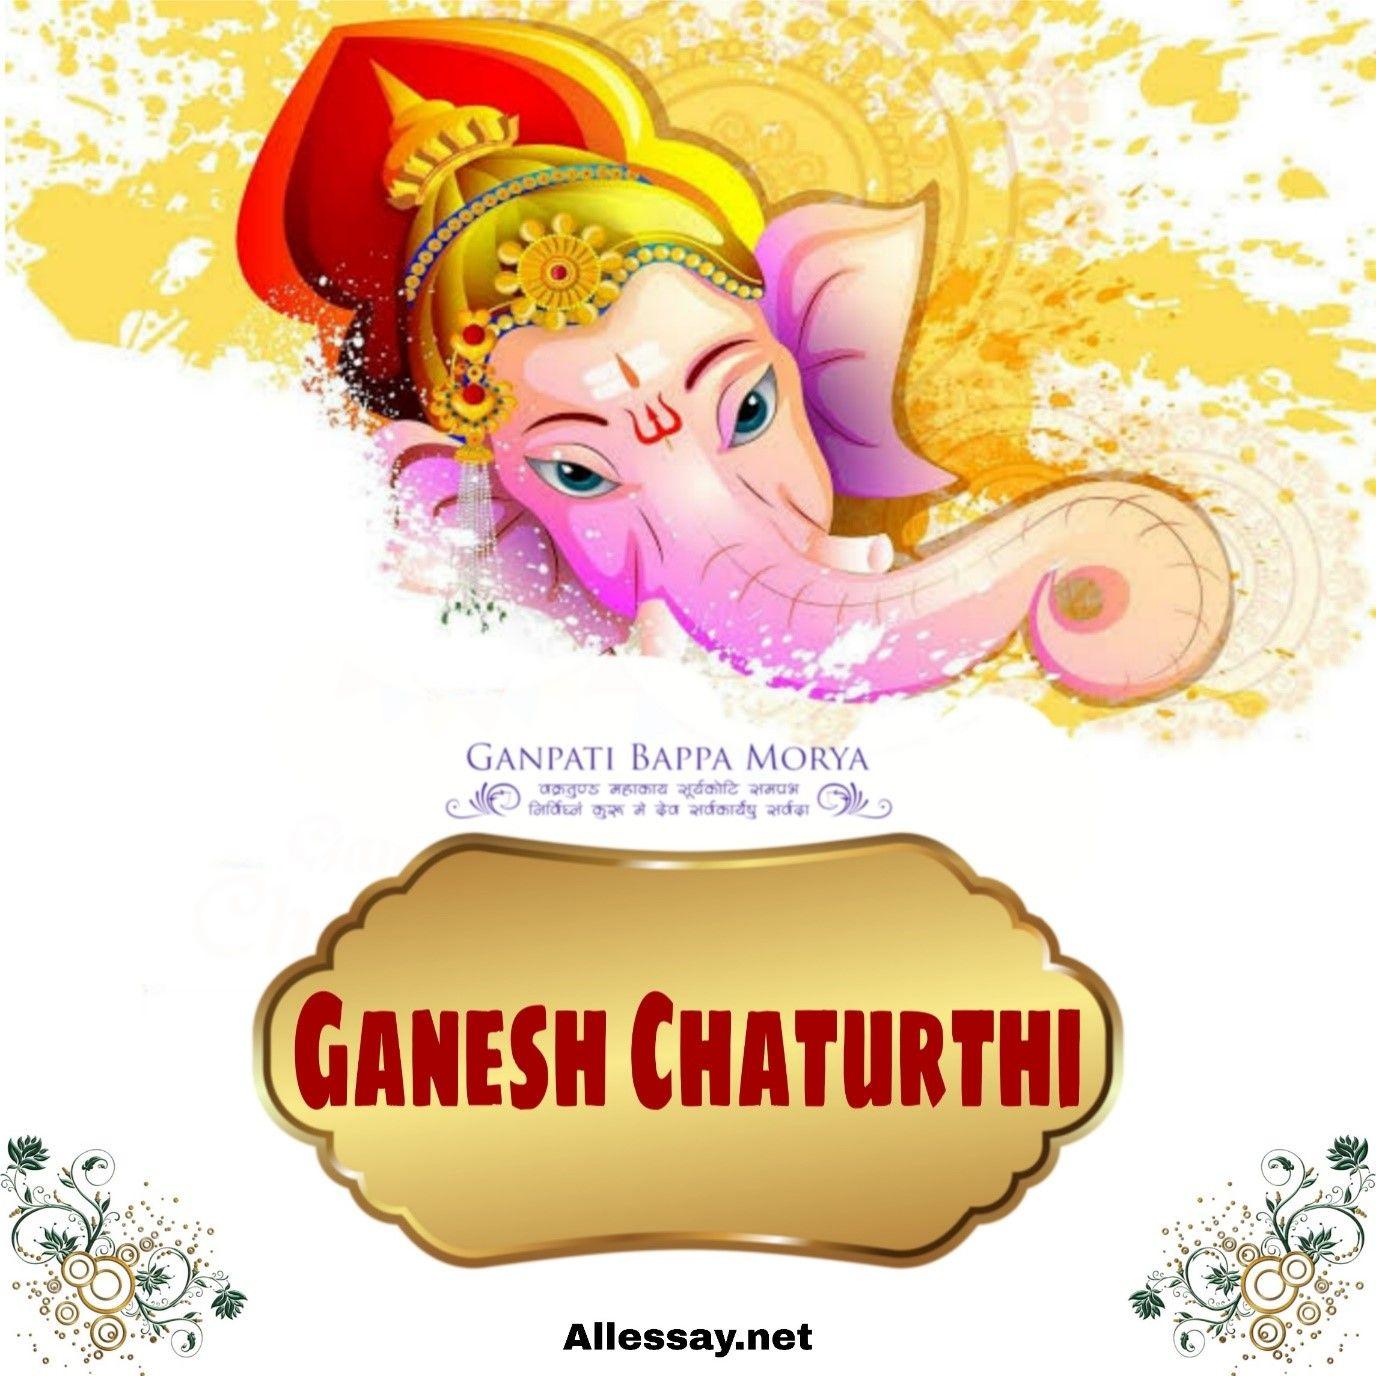 Ganesh Chaturthi Essay Happy Ganpati Bappa On Lord Ganesha